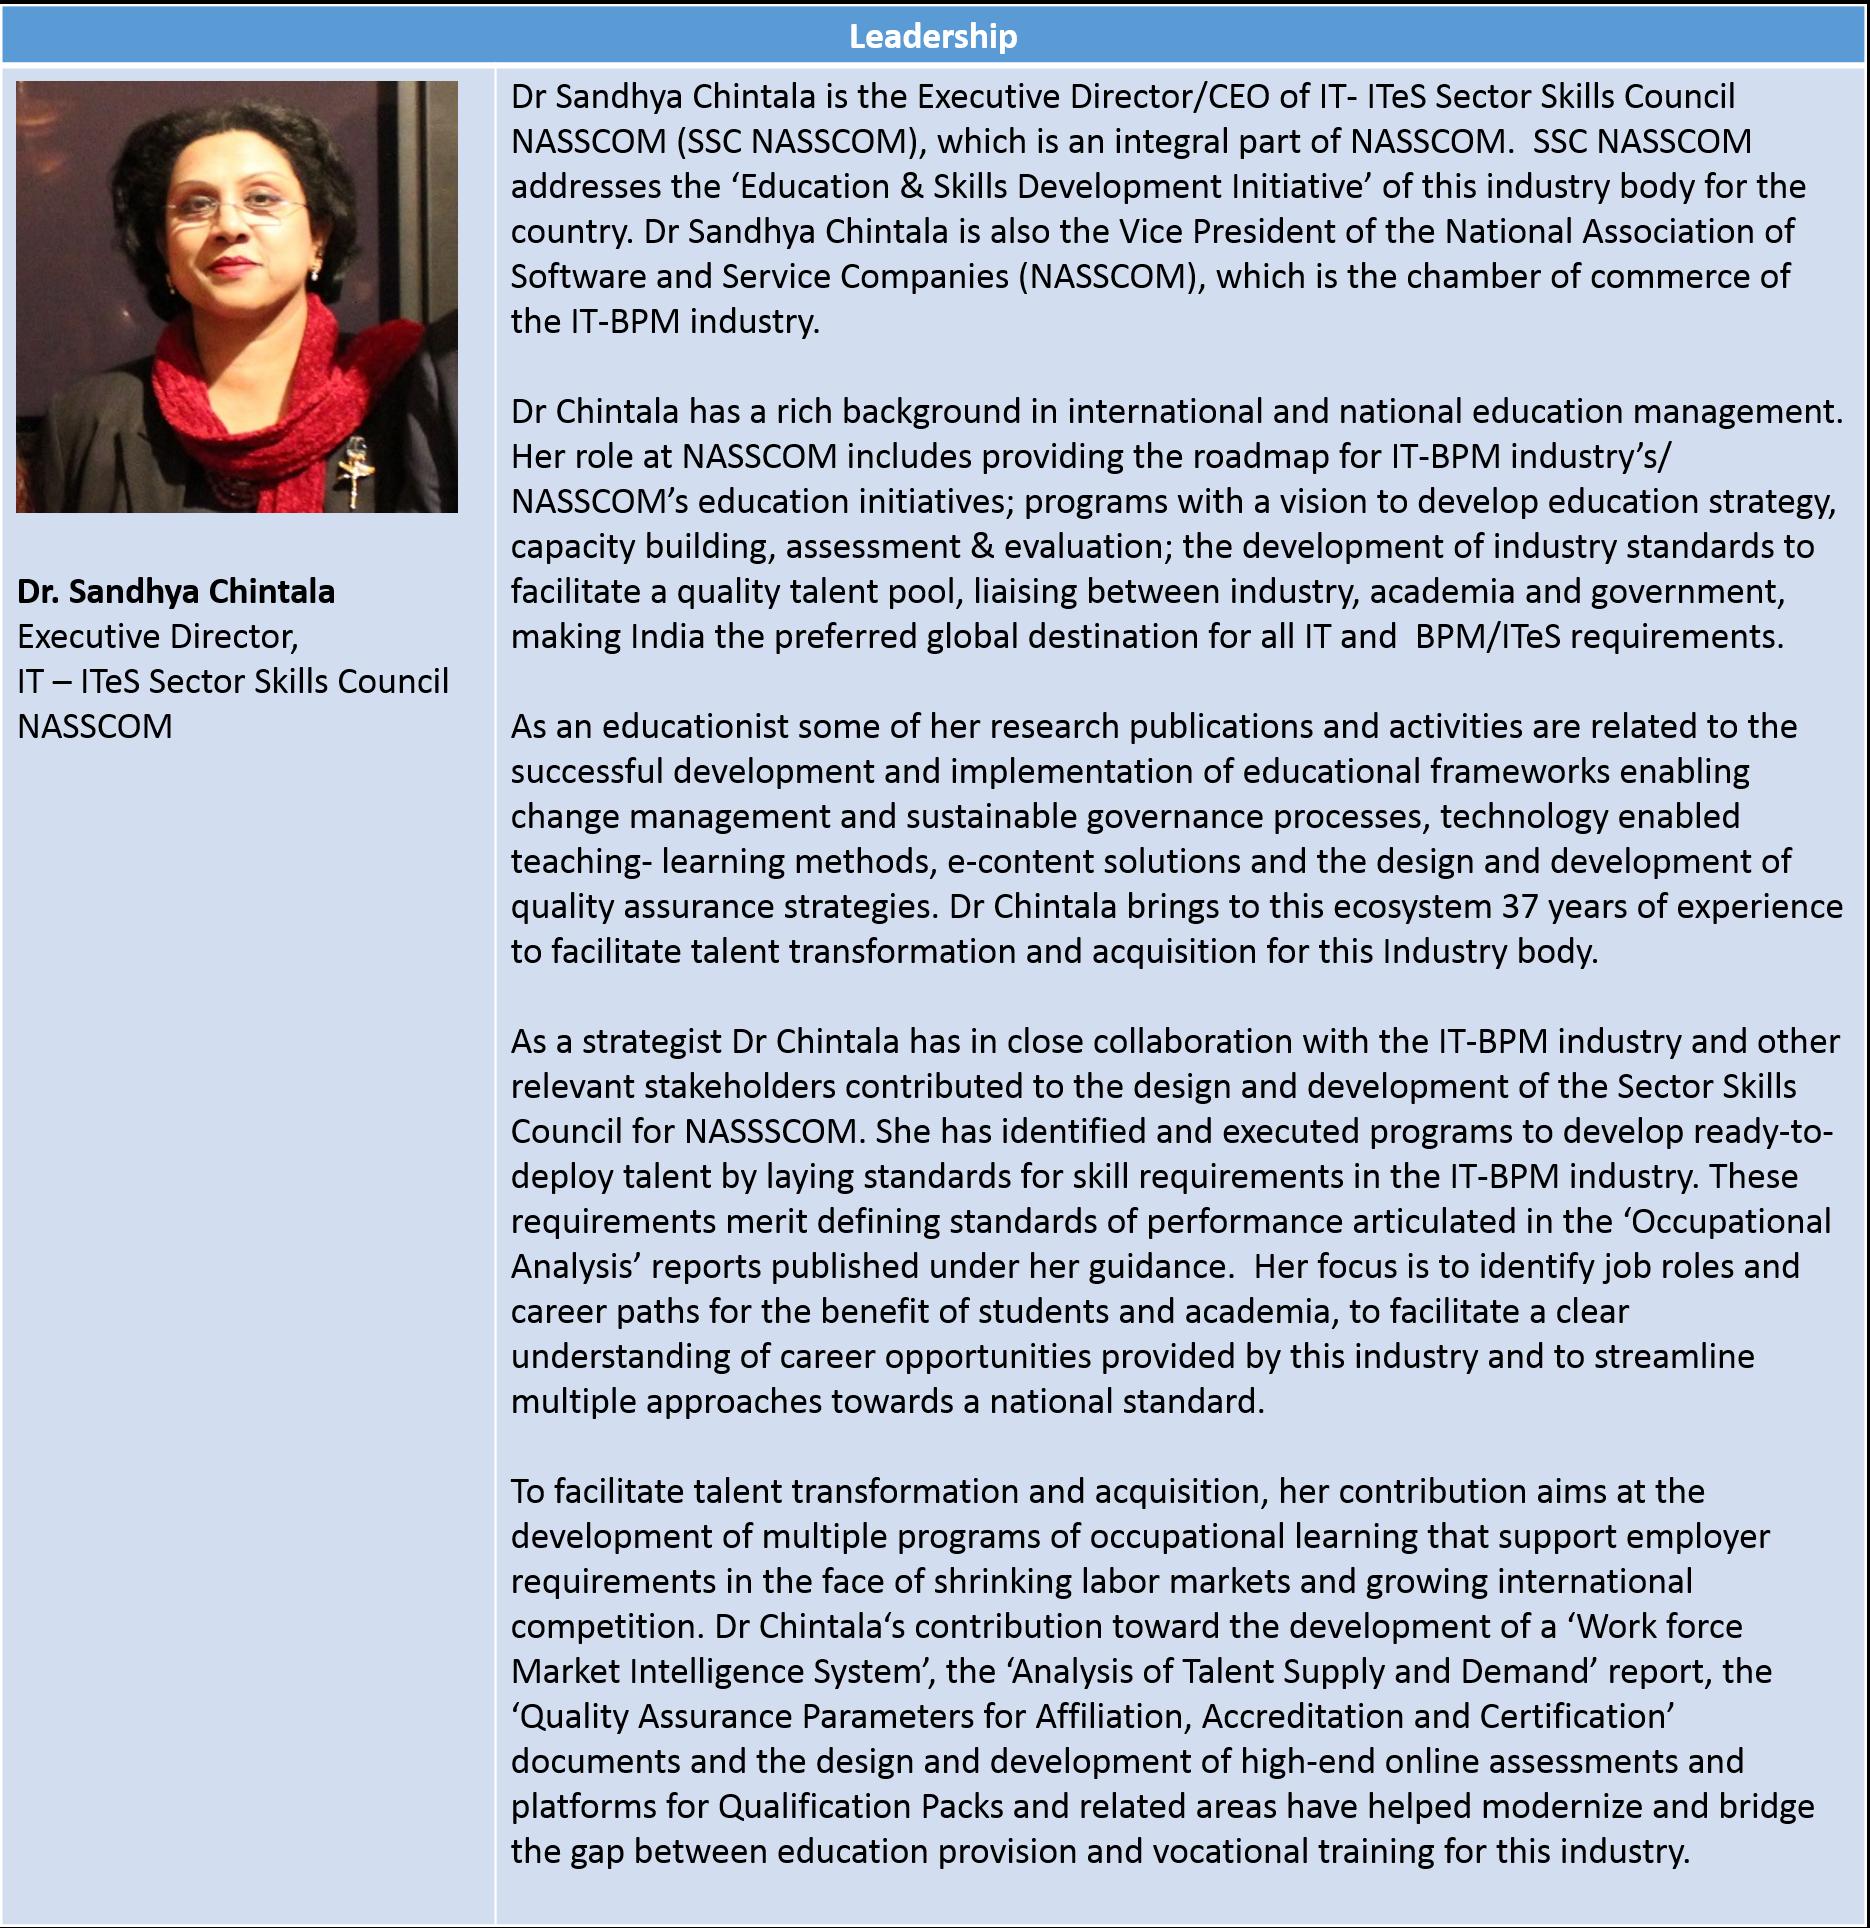 Dr. Sandhya Chintala's Profile